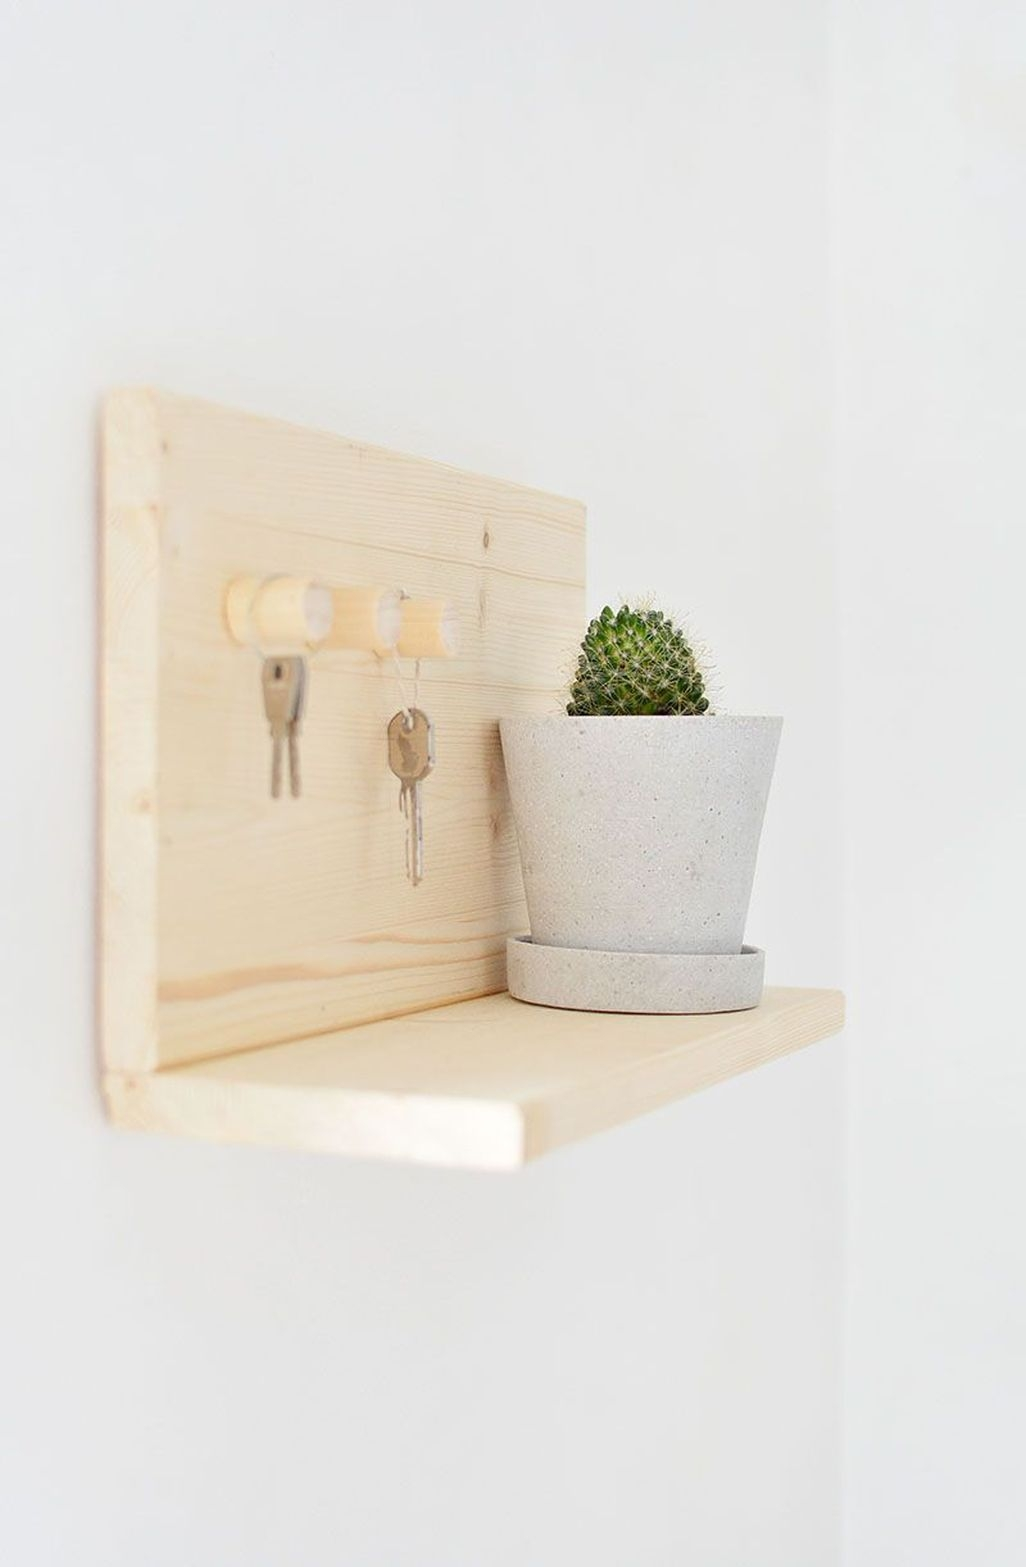 Creative Diy Wooden Home Decorations Ideas 16